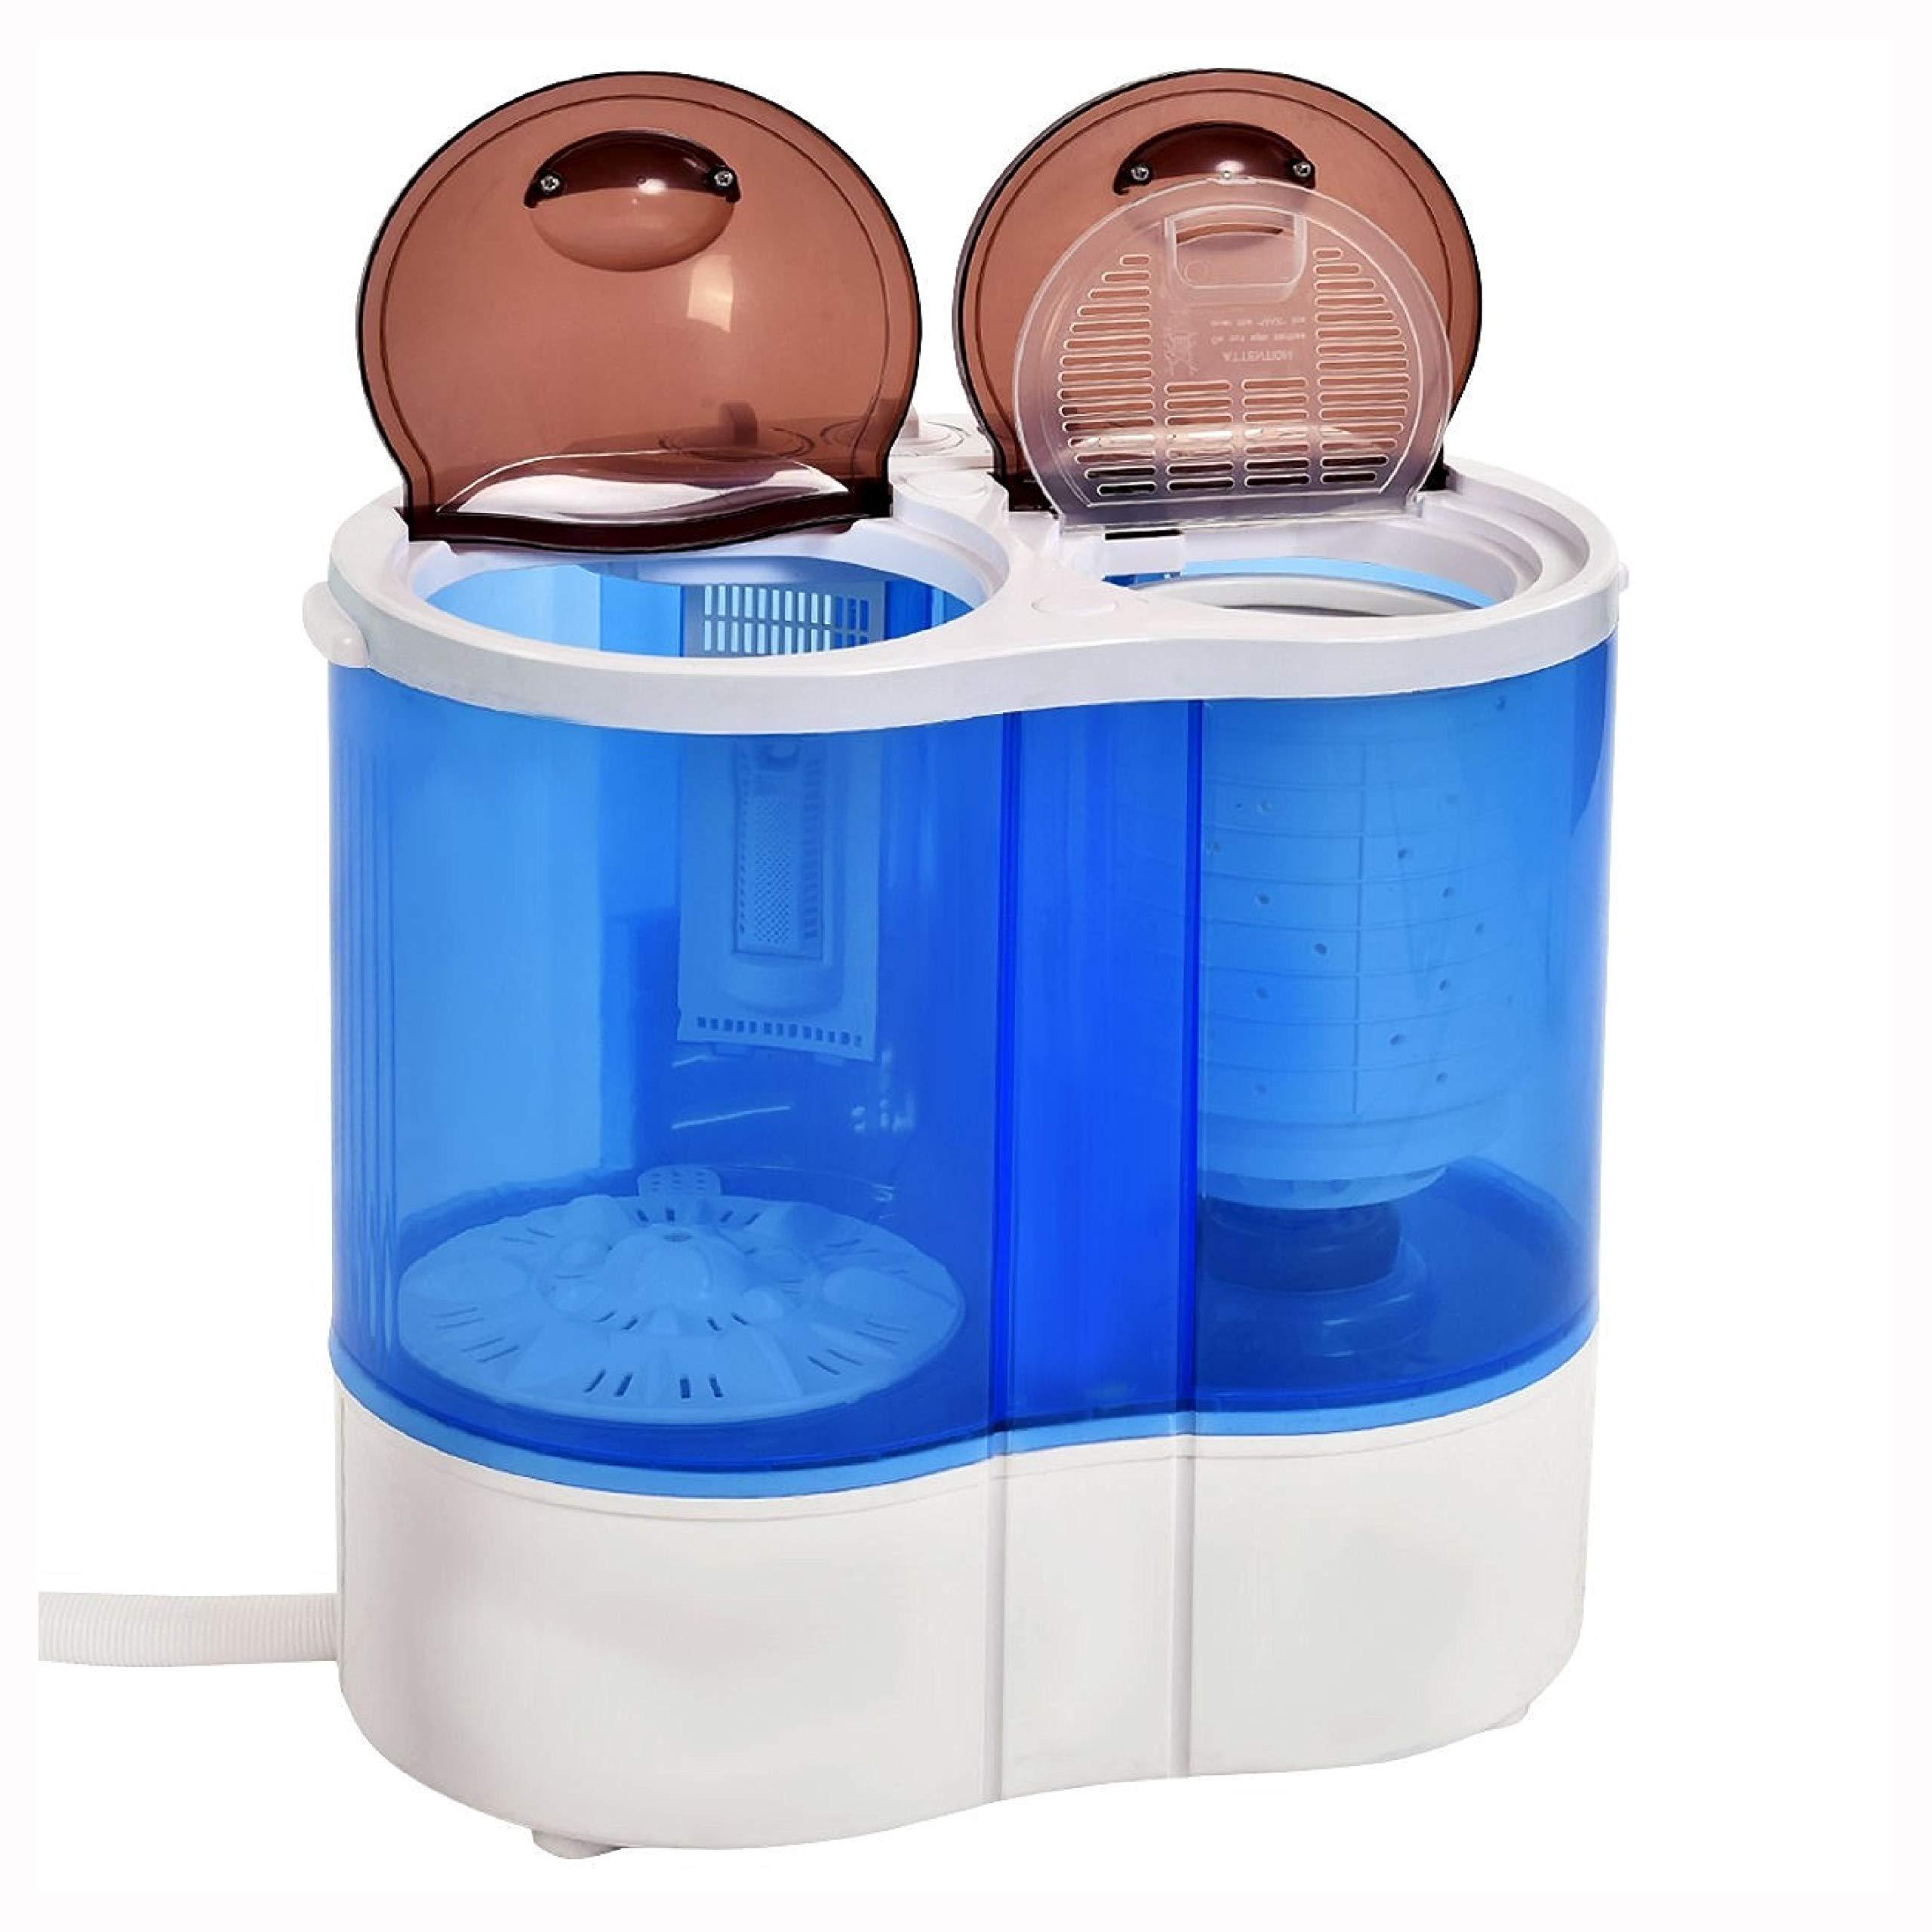 Washing Machine, 15 lbs Portable Compact Twin Tub Mini Washing Machine by HomyDelight (Image #7)